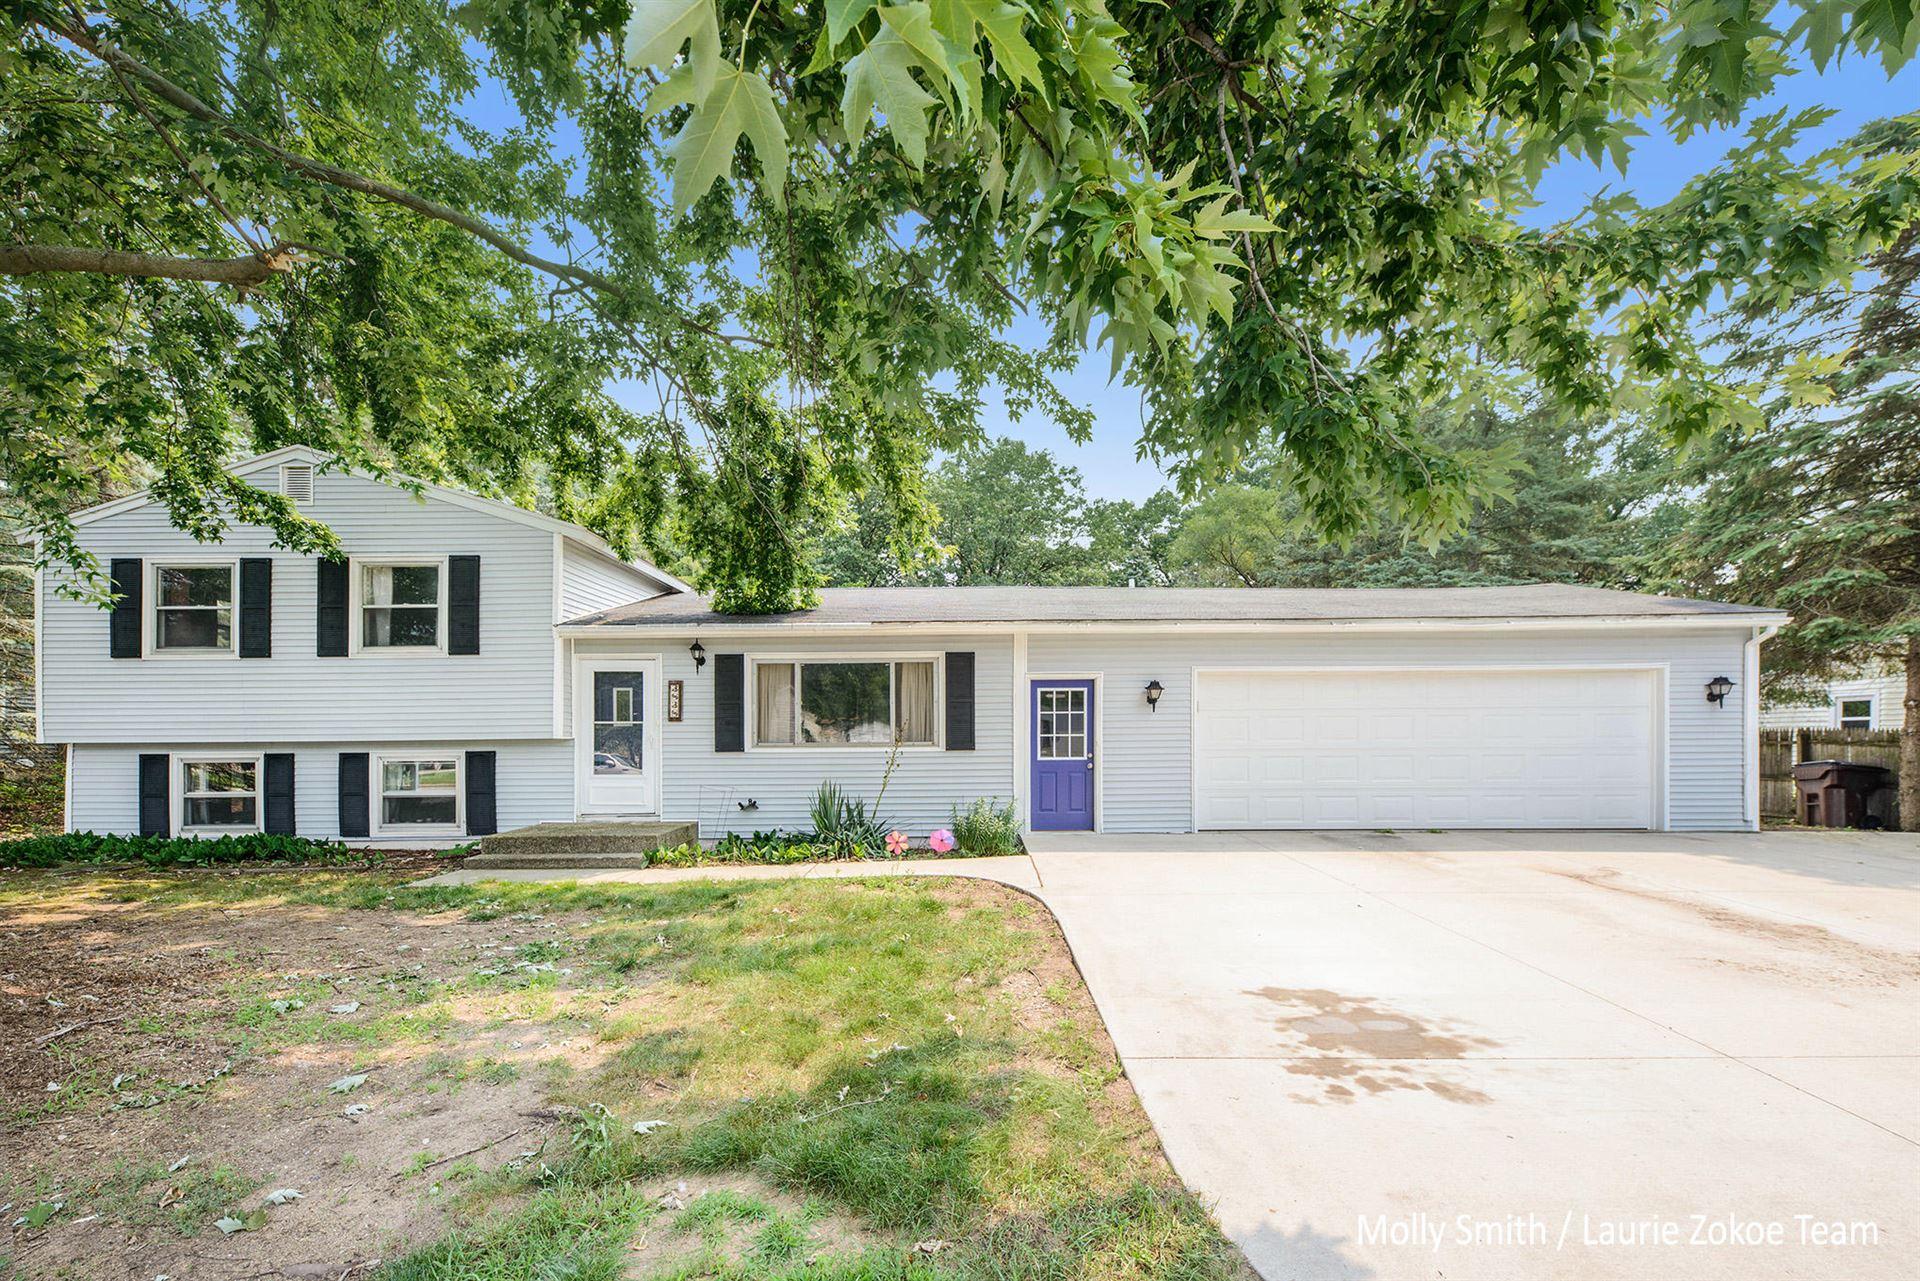 3838 Boone Avenue SW, Wyoming, MI 49519 - MLS#: 21065863